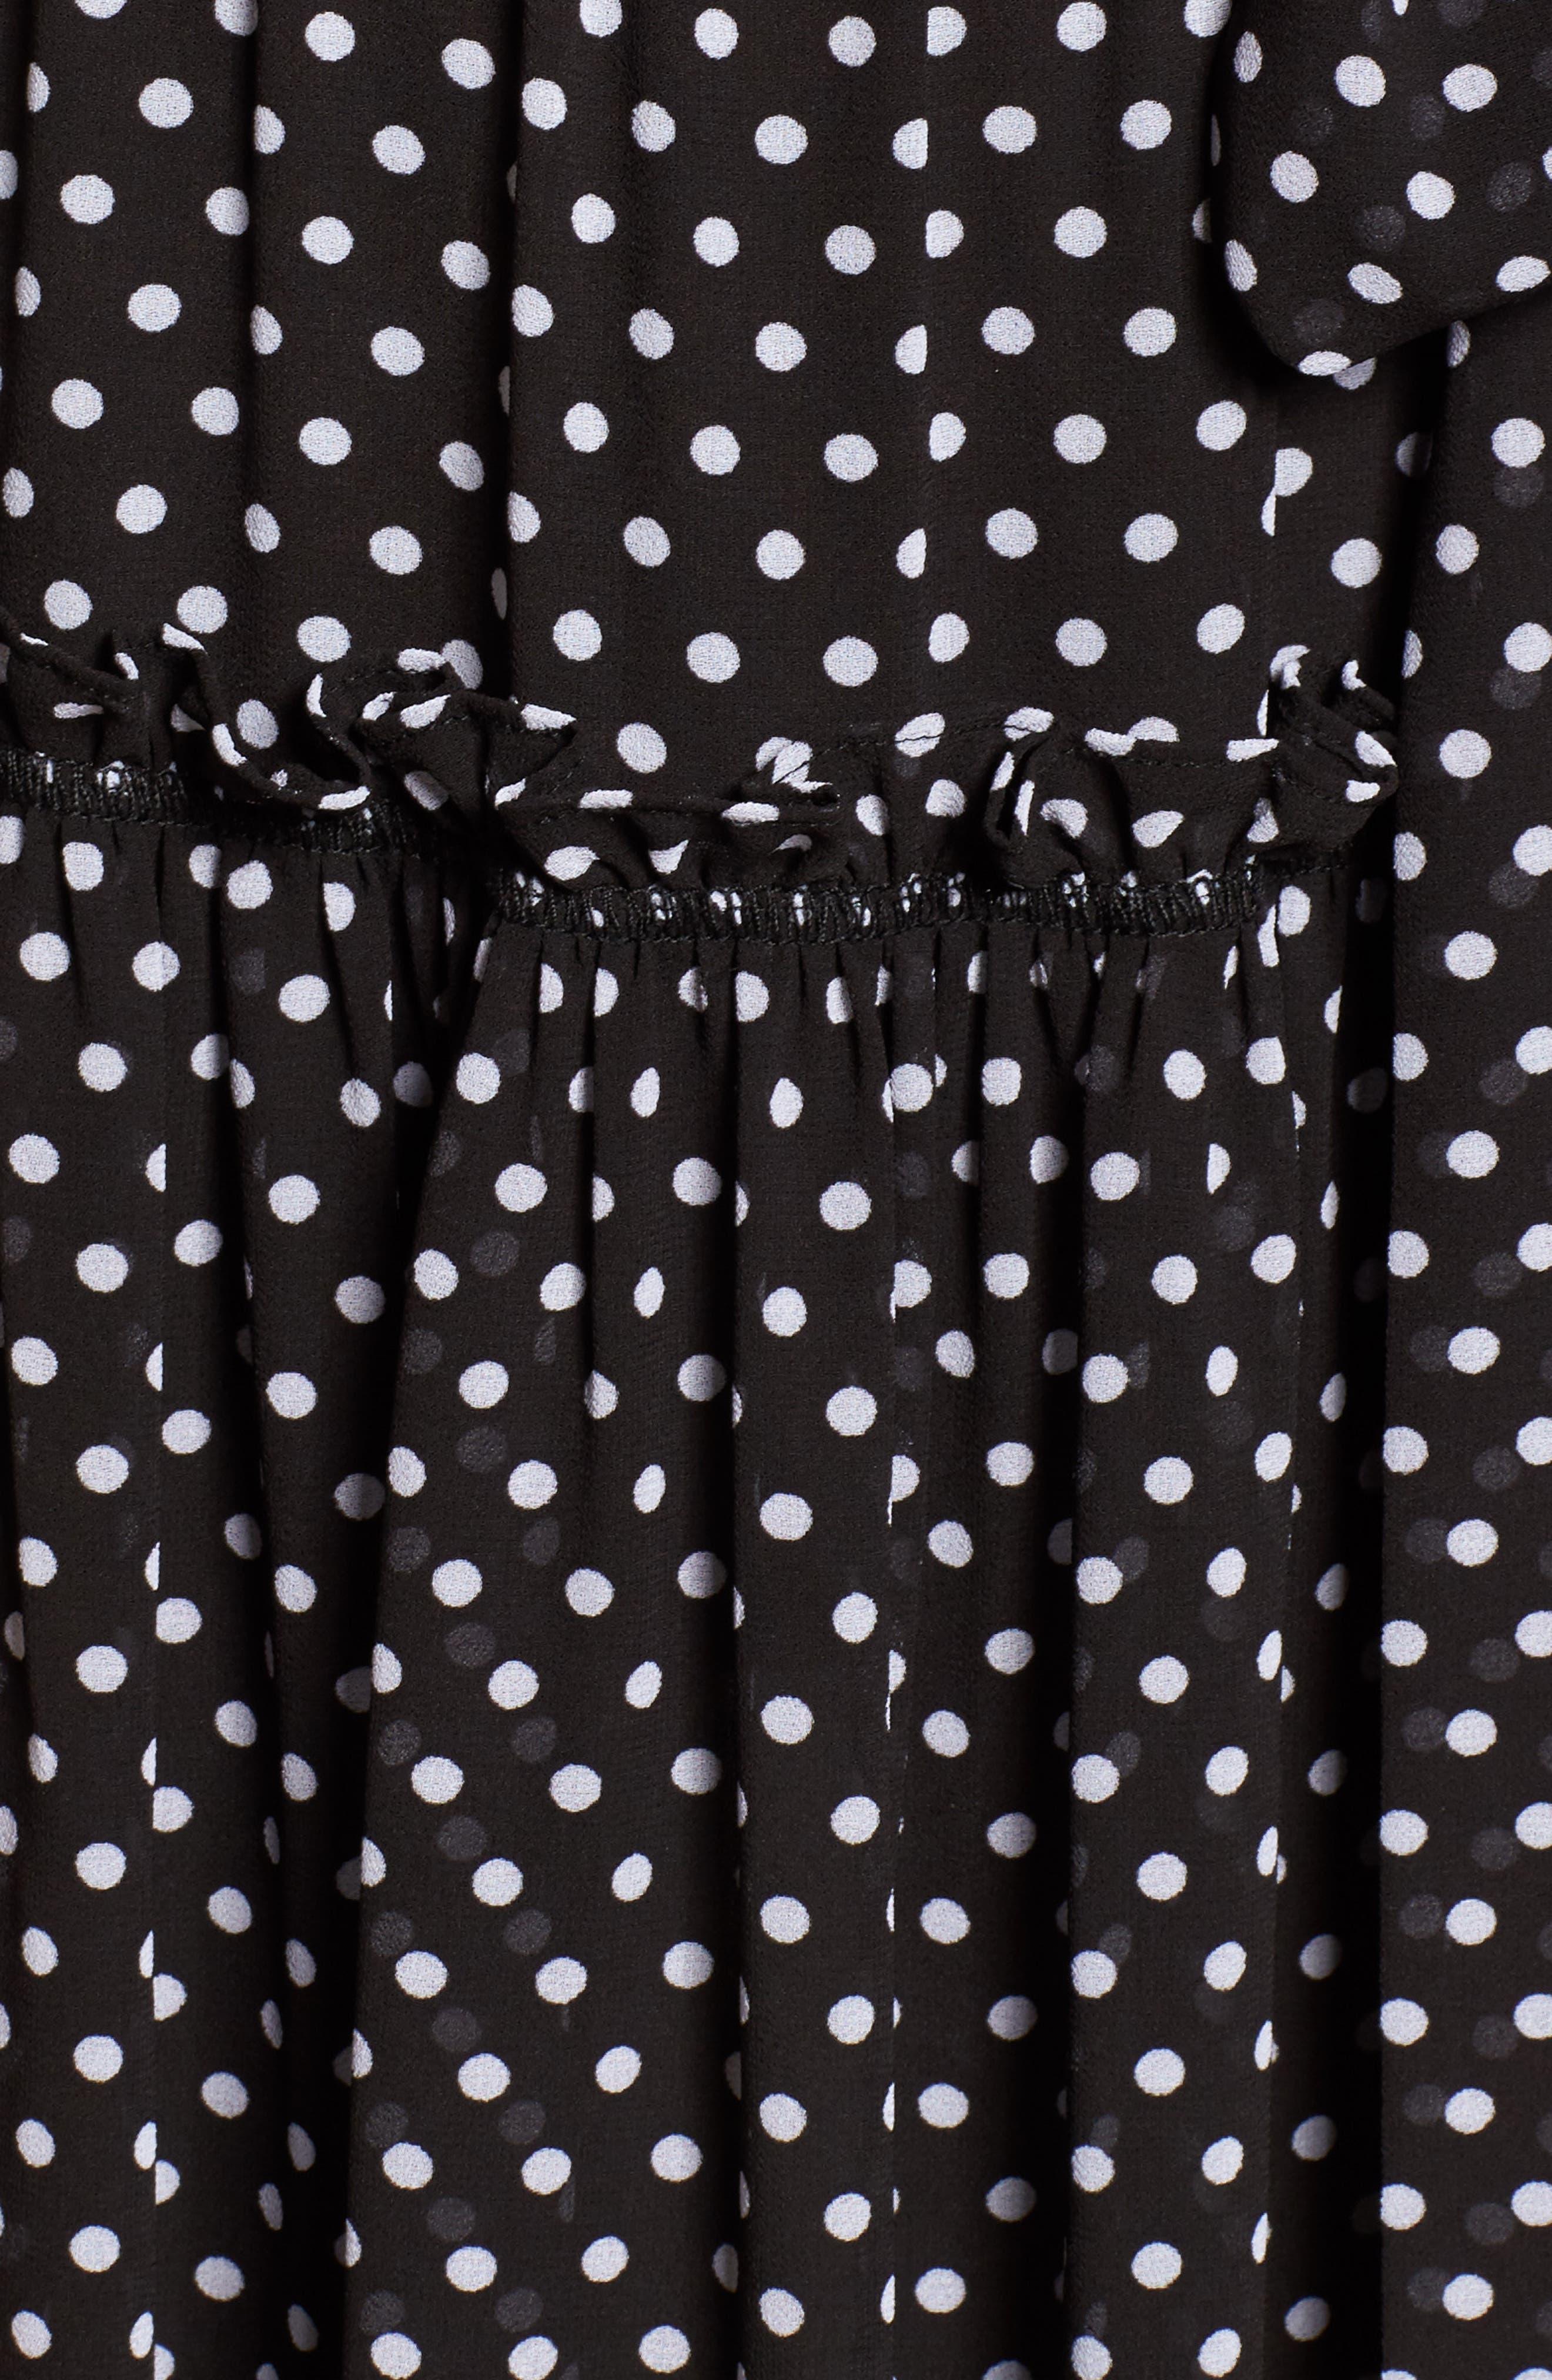 Tiered Dot Boho Dress,                             Alternate thumbnail 5, color,                             Black/ White